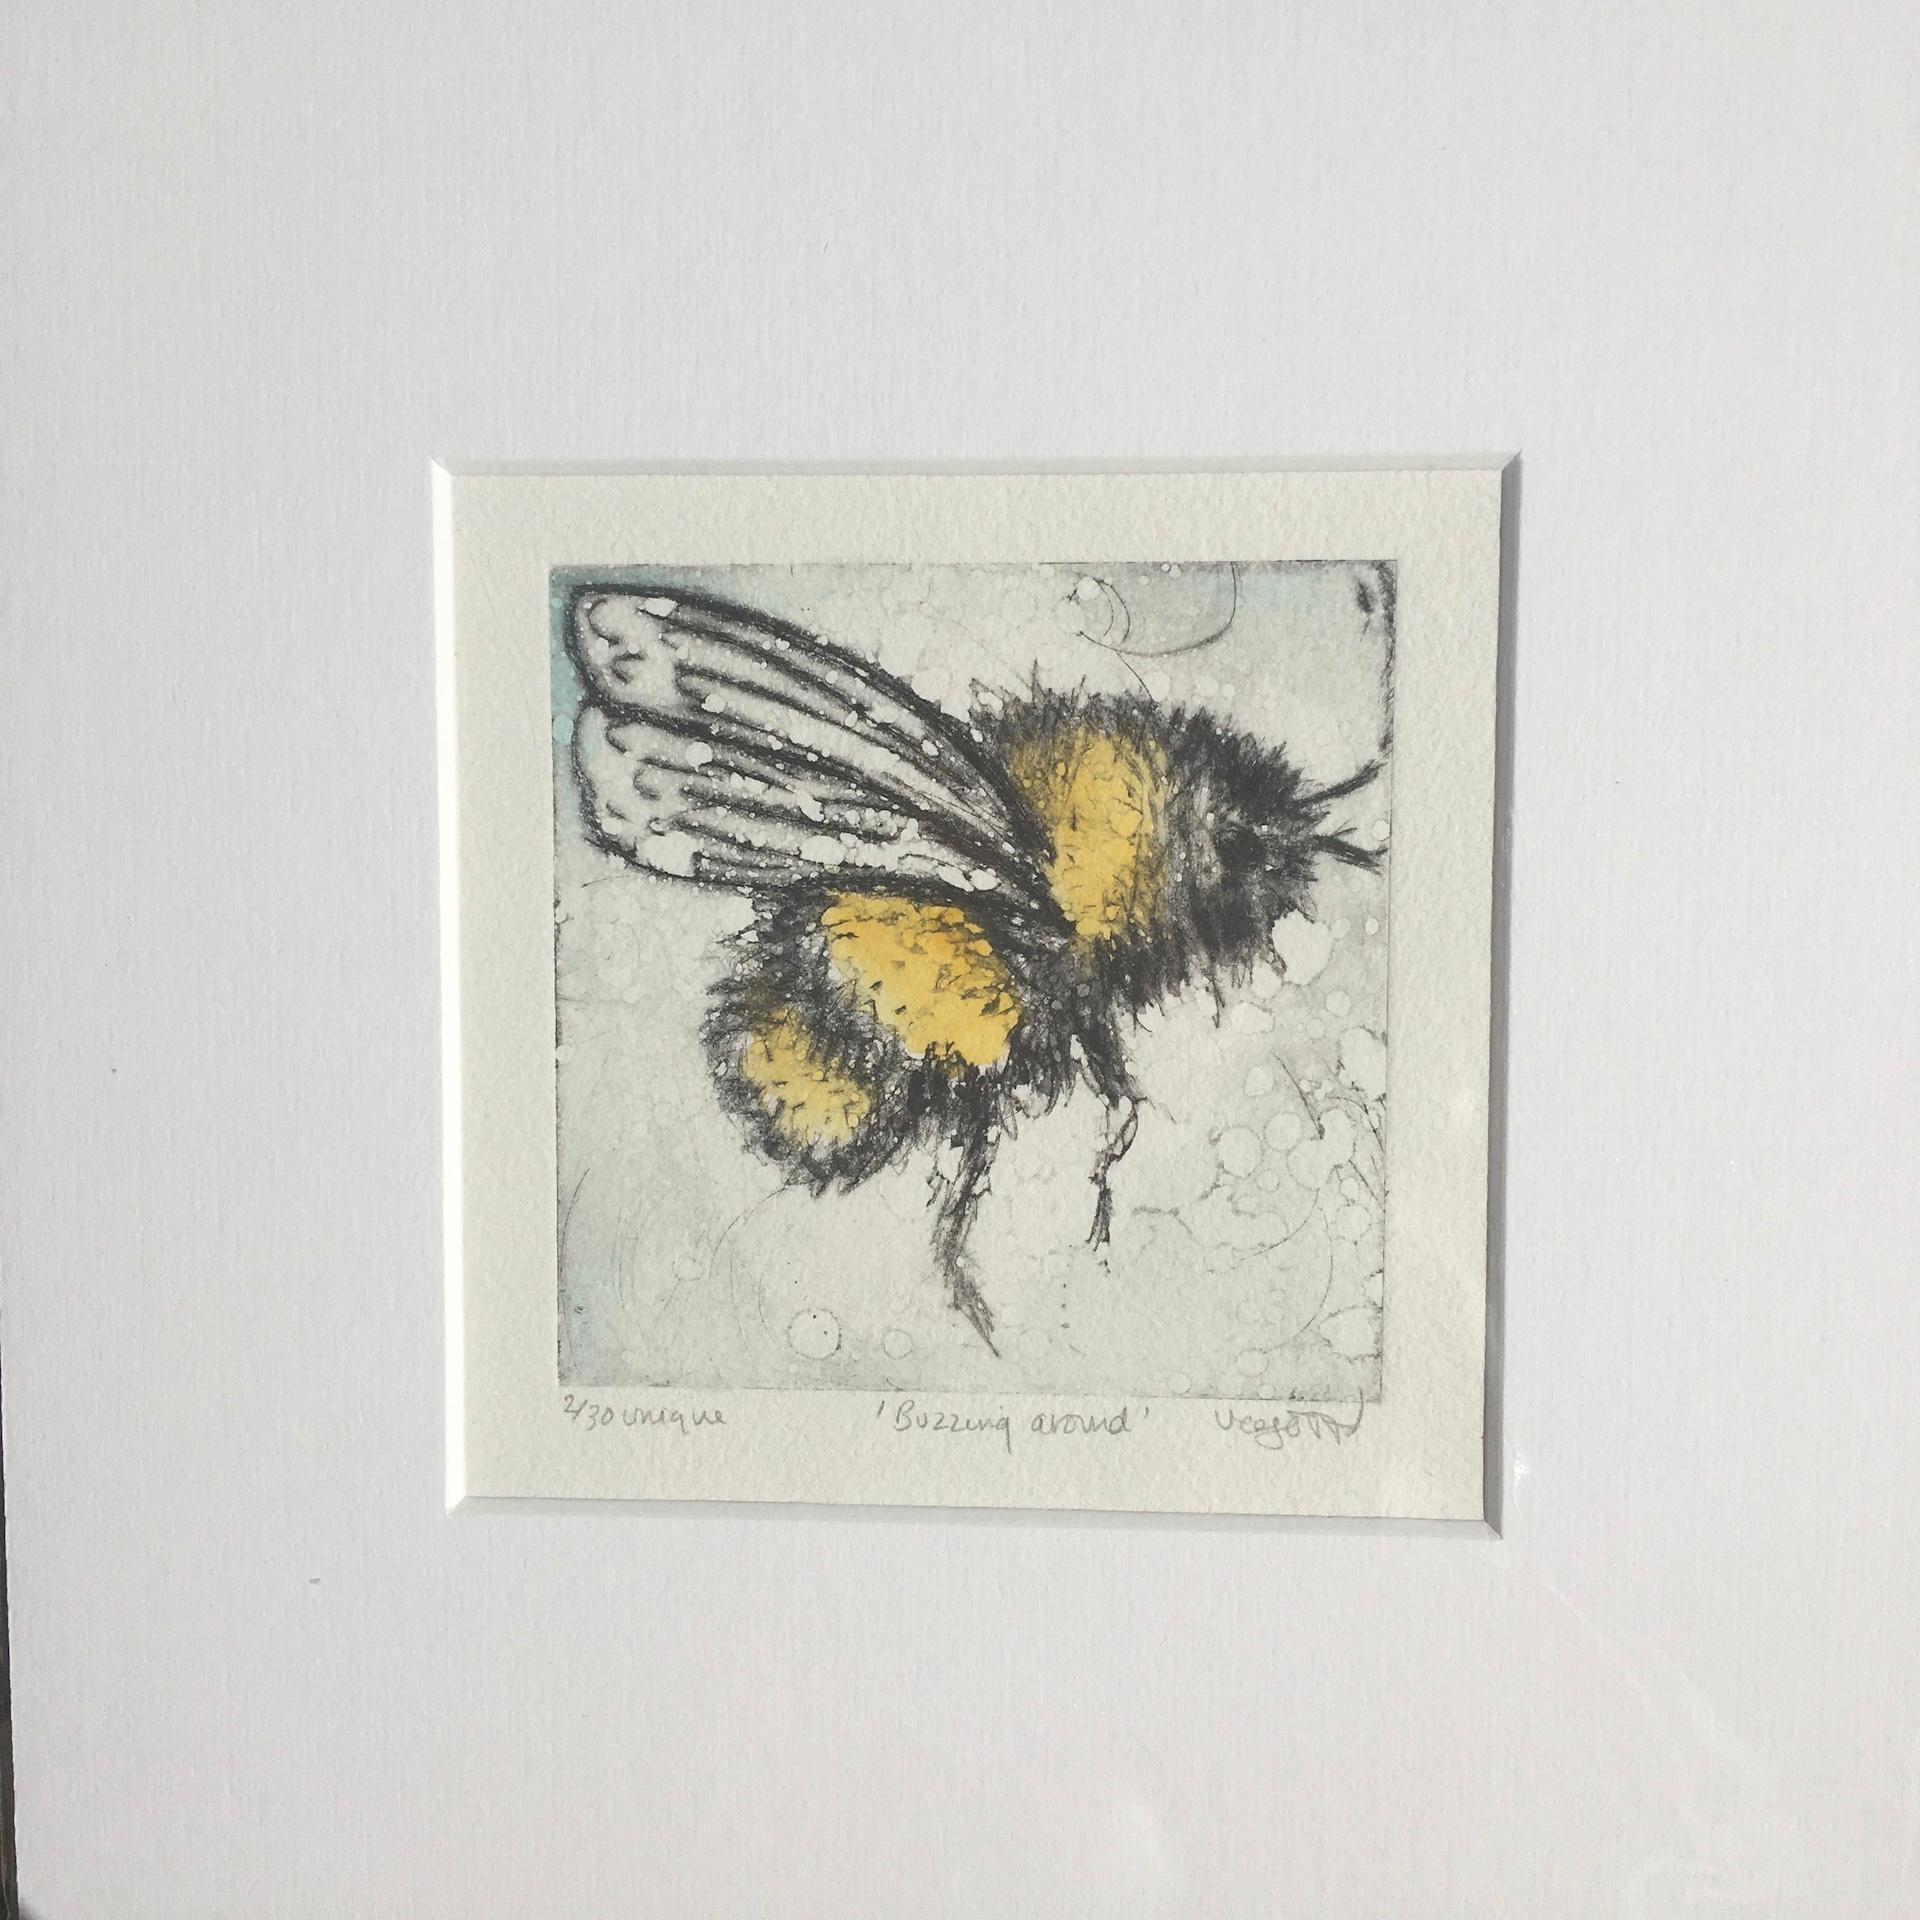 Vicky Oldfield, Buzzing Around, Animal Art, Contemporary Collograph Print